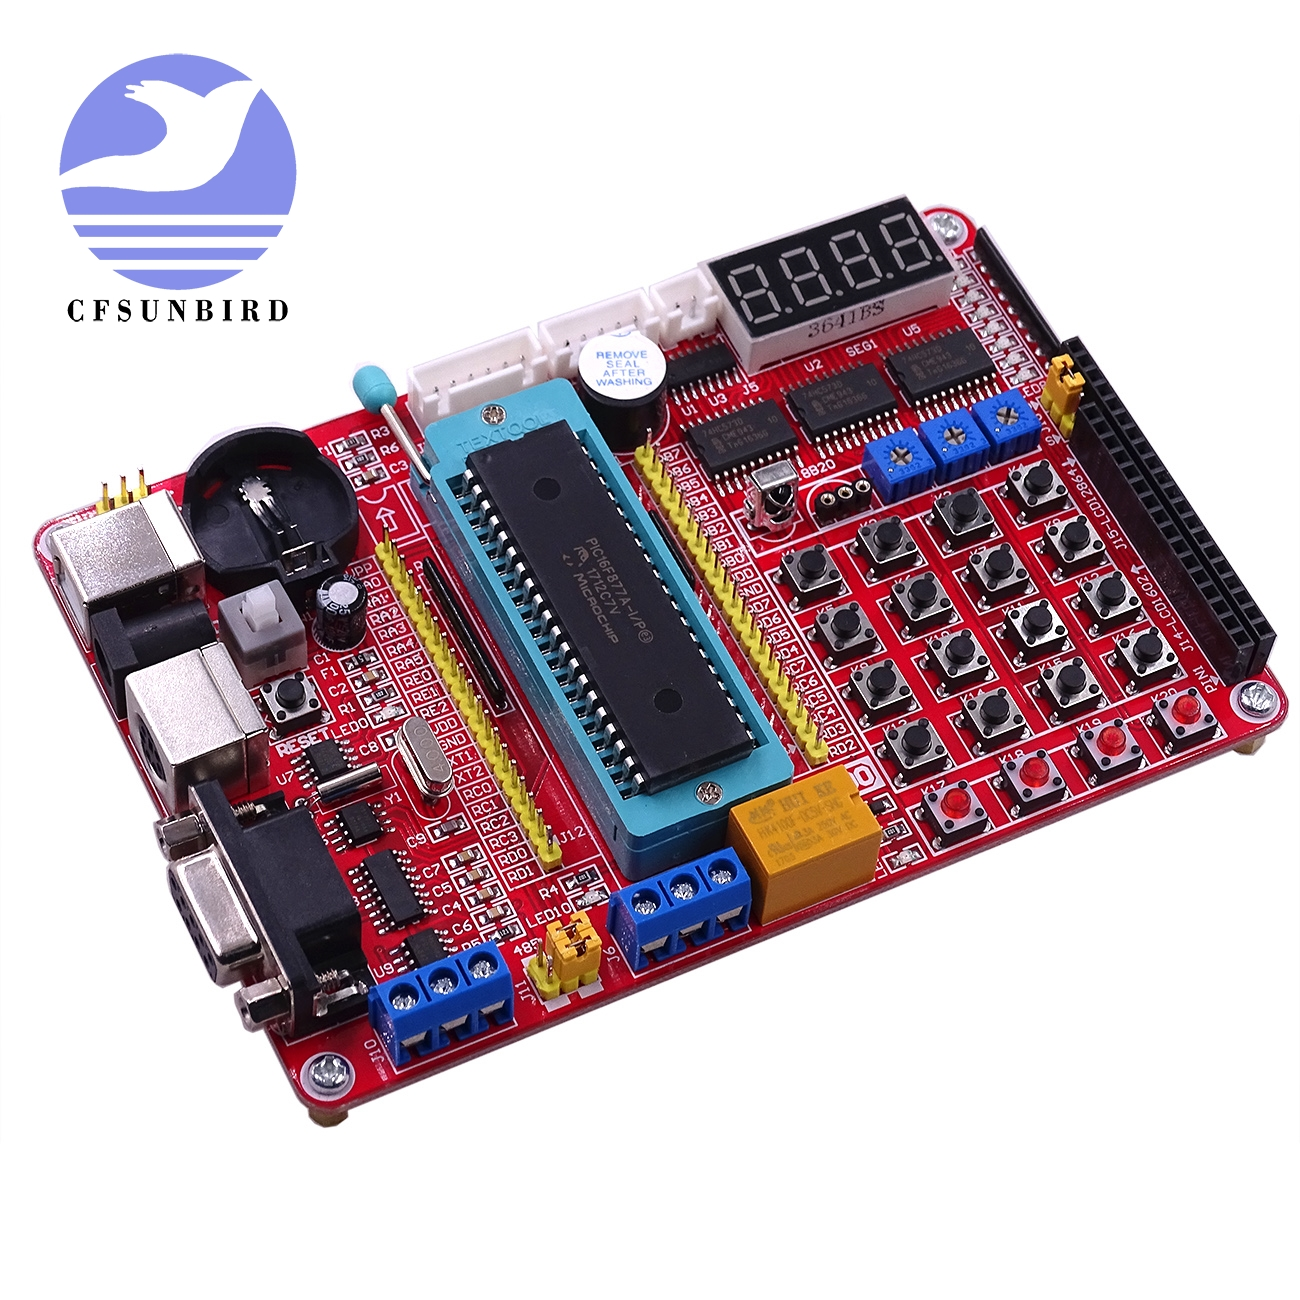 PIC MCU Development  Mini System PIC Development Board + Microchip PIC16F877A + USB Cable(China)